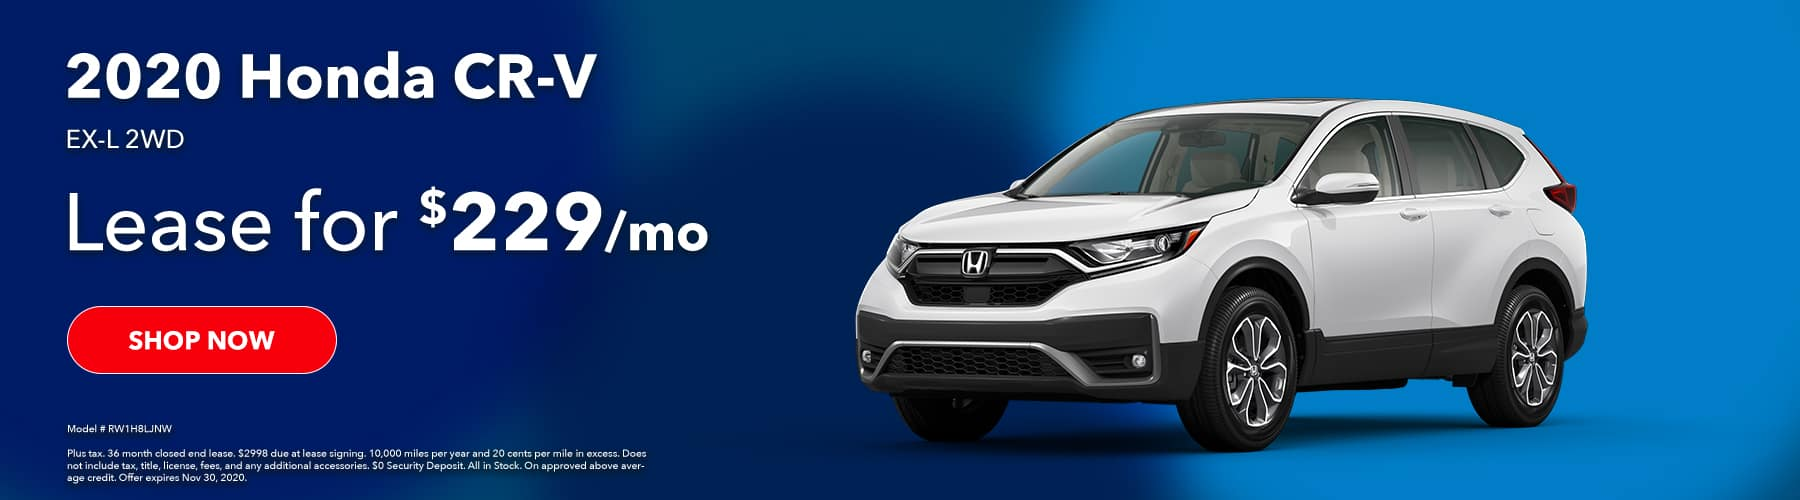 2020 Honda CRV EX-L